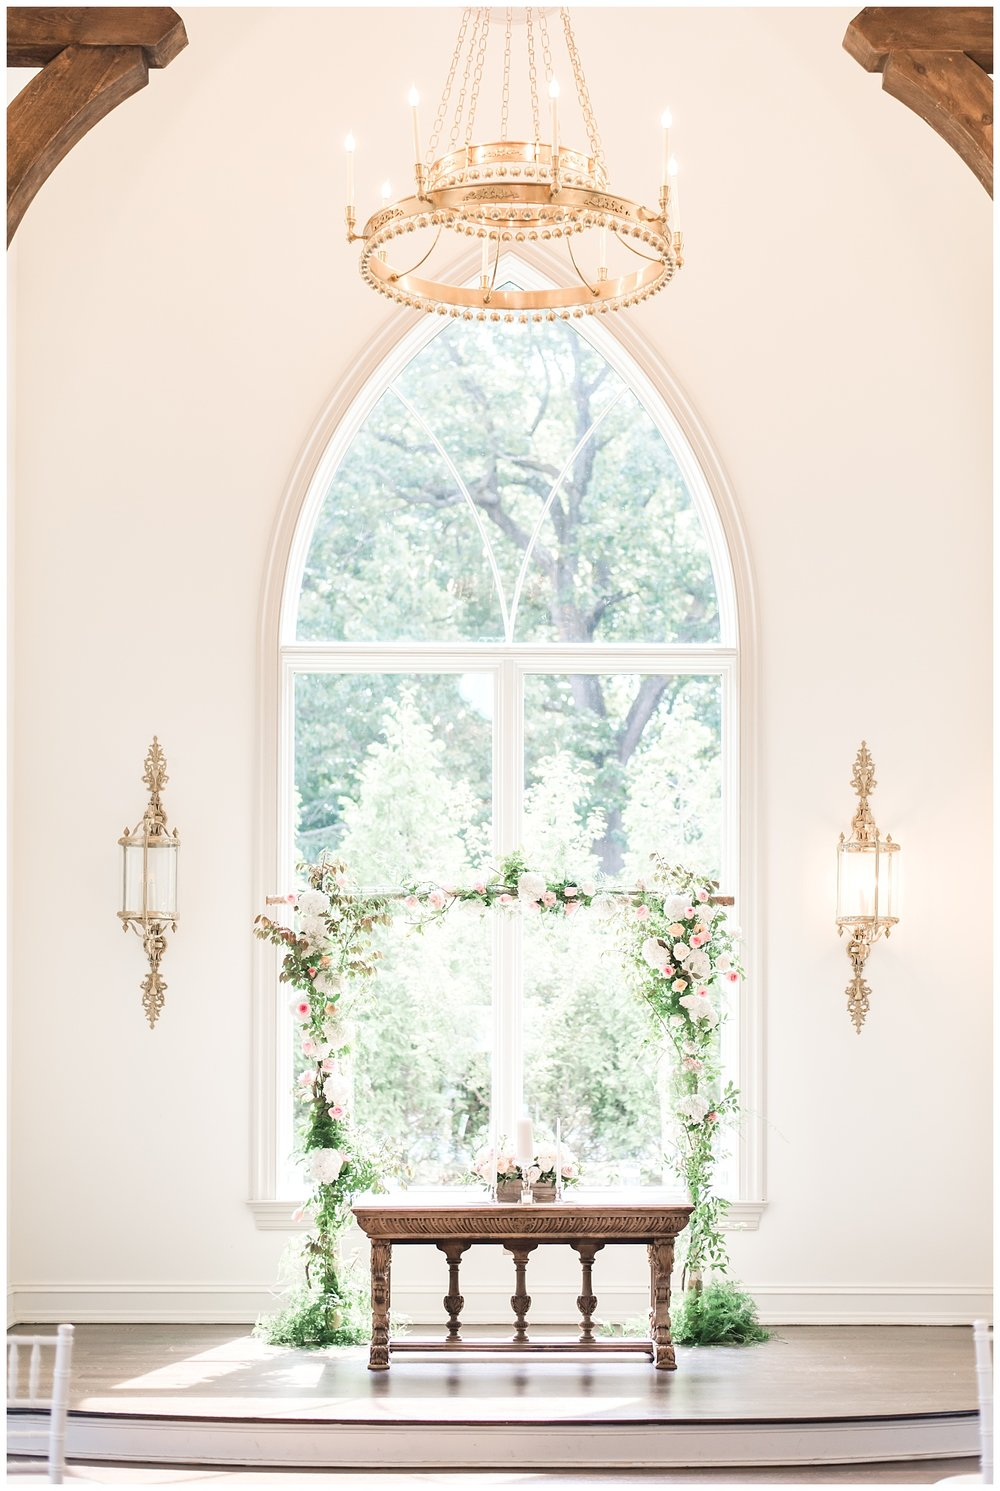 park-chateau-wedding-fabiana-skubic-photography (34).jpg